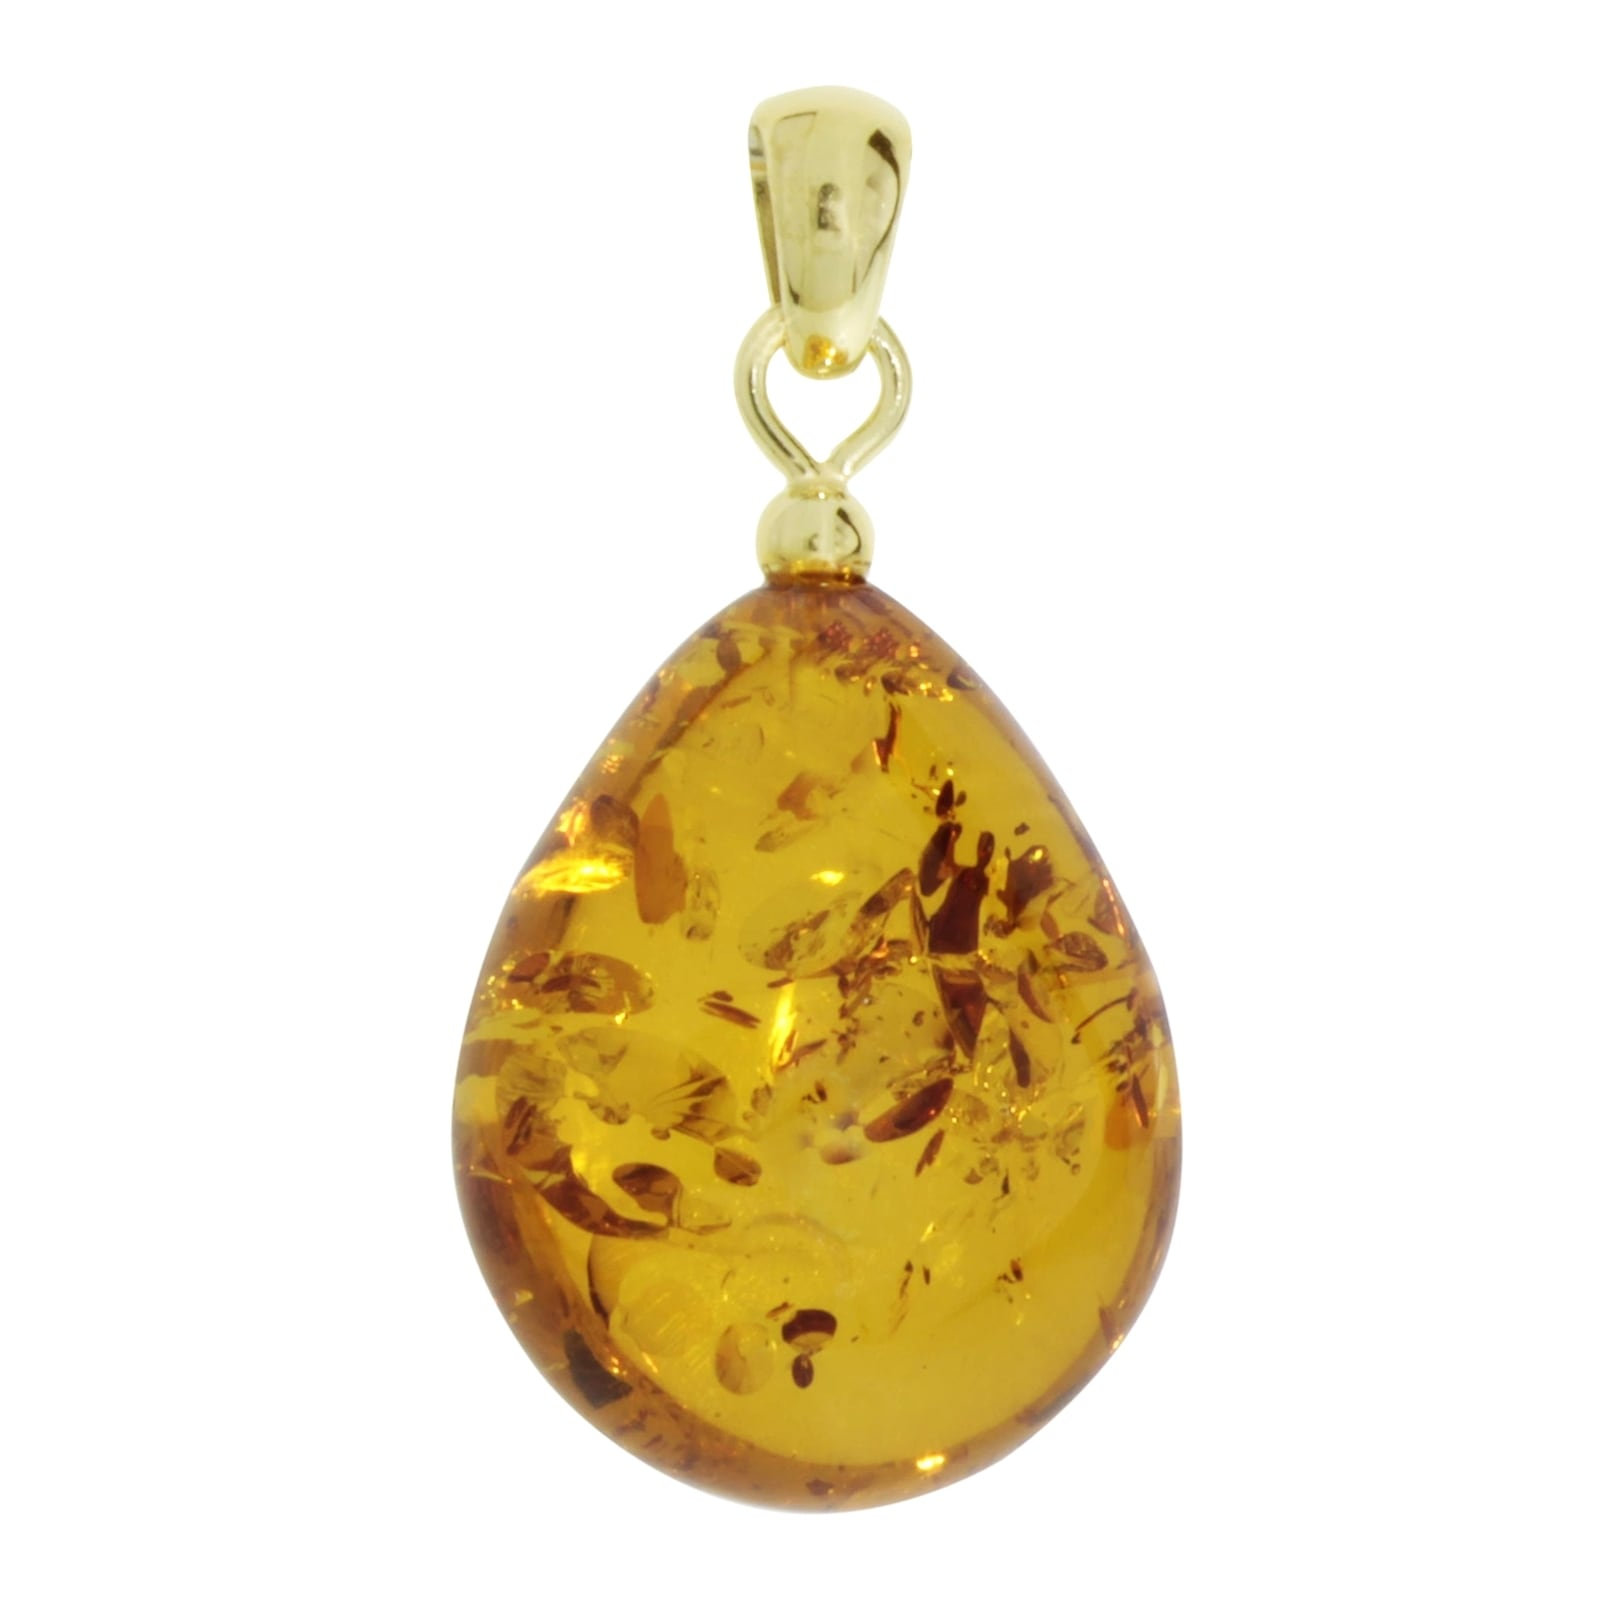 OSTSEE-SCHMUCK Kettenanhänger Tropfen ca 22 mm lang - Gold 333/000 Bernstein | Schmuck > Halsketten > Goldketten | Ostsee-Schmuck